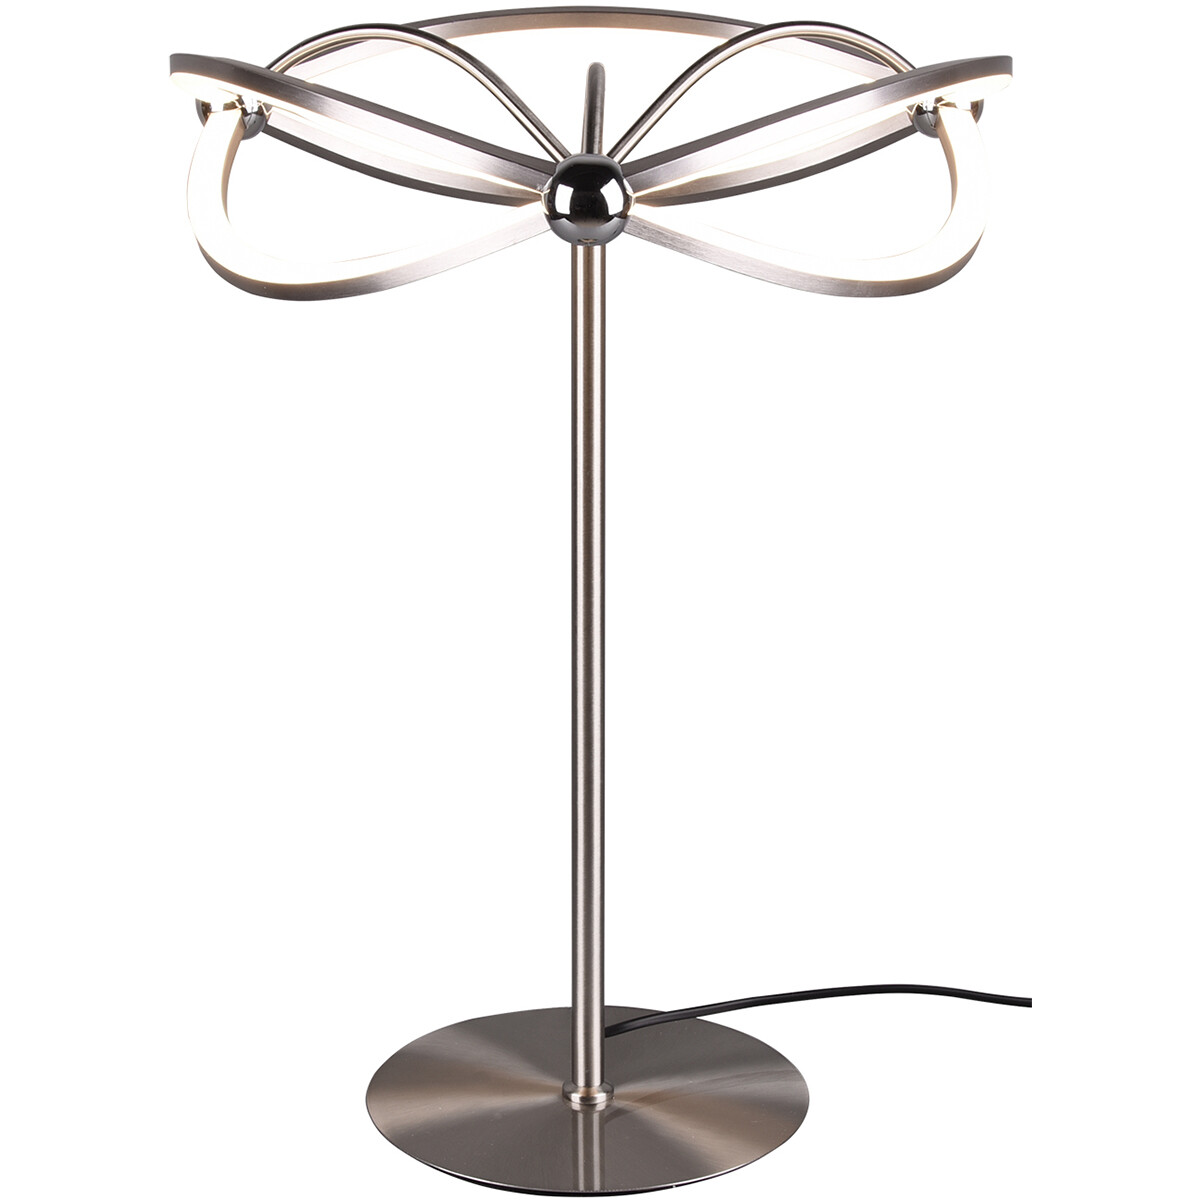 LED Tafellamp - Tafelverlichting - Trion Charis - 20W - Warm Wit 3000K - Dimbaar - Rond - Mat Nikkel - Aluminium